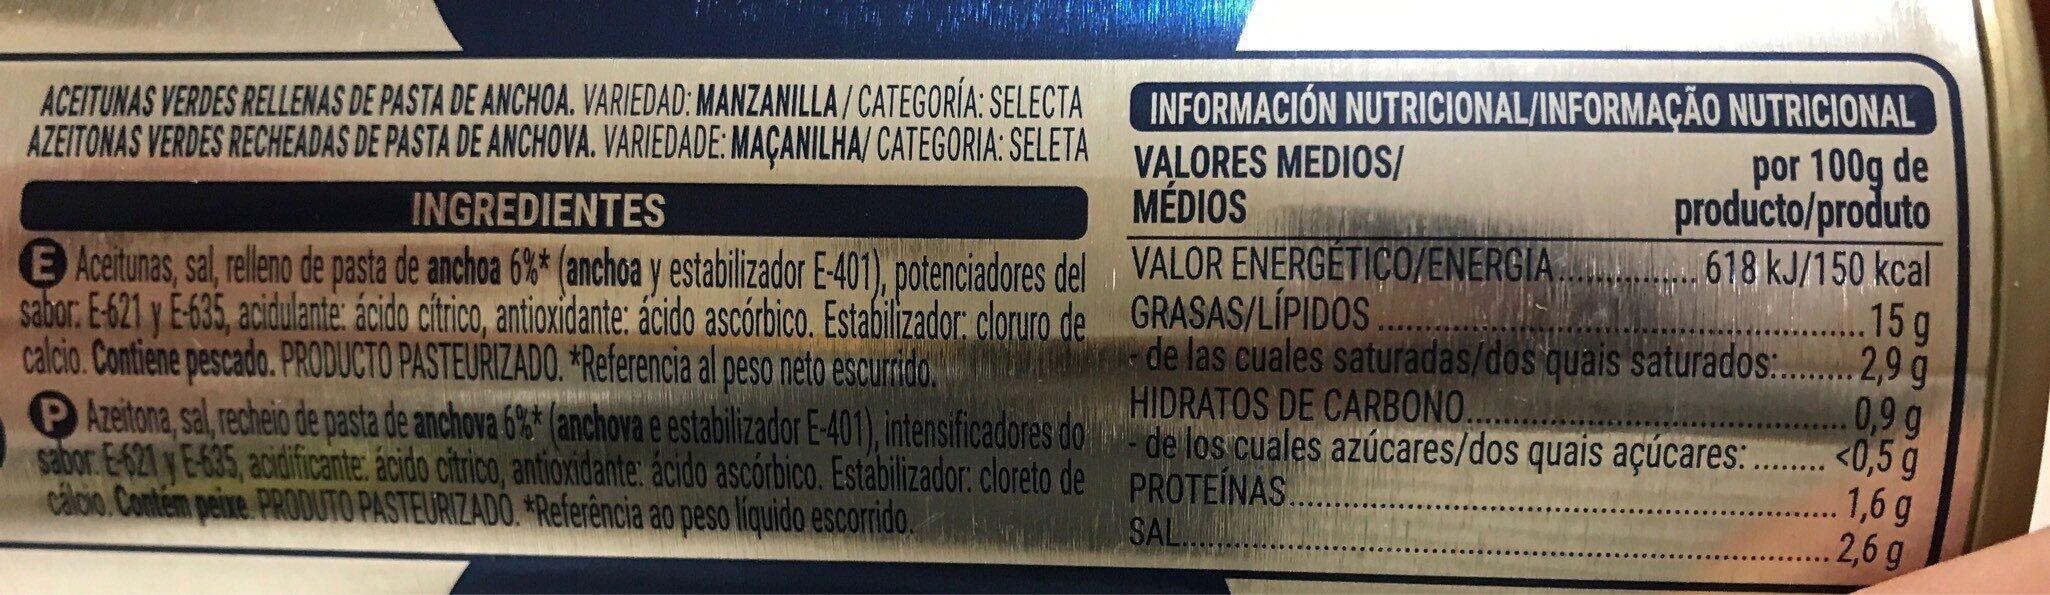 Aceitunas Verdes Rellenas De Anchoa - Categoria Selecta - Voedingswaarden